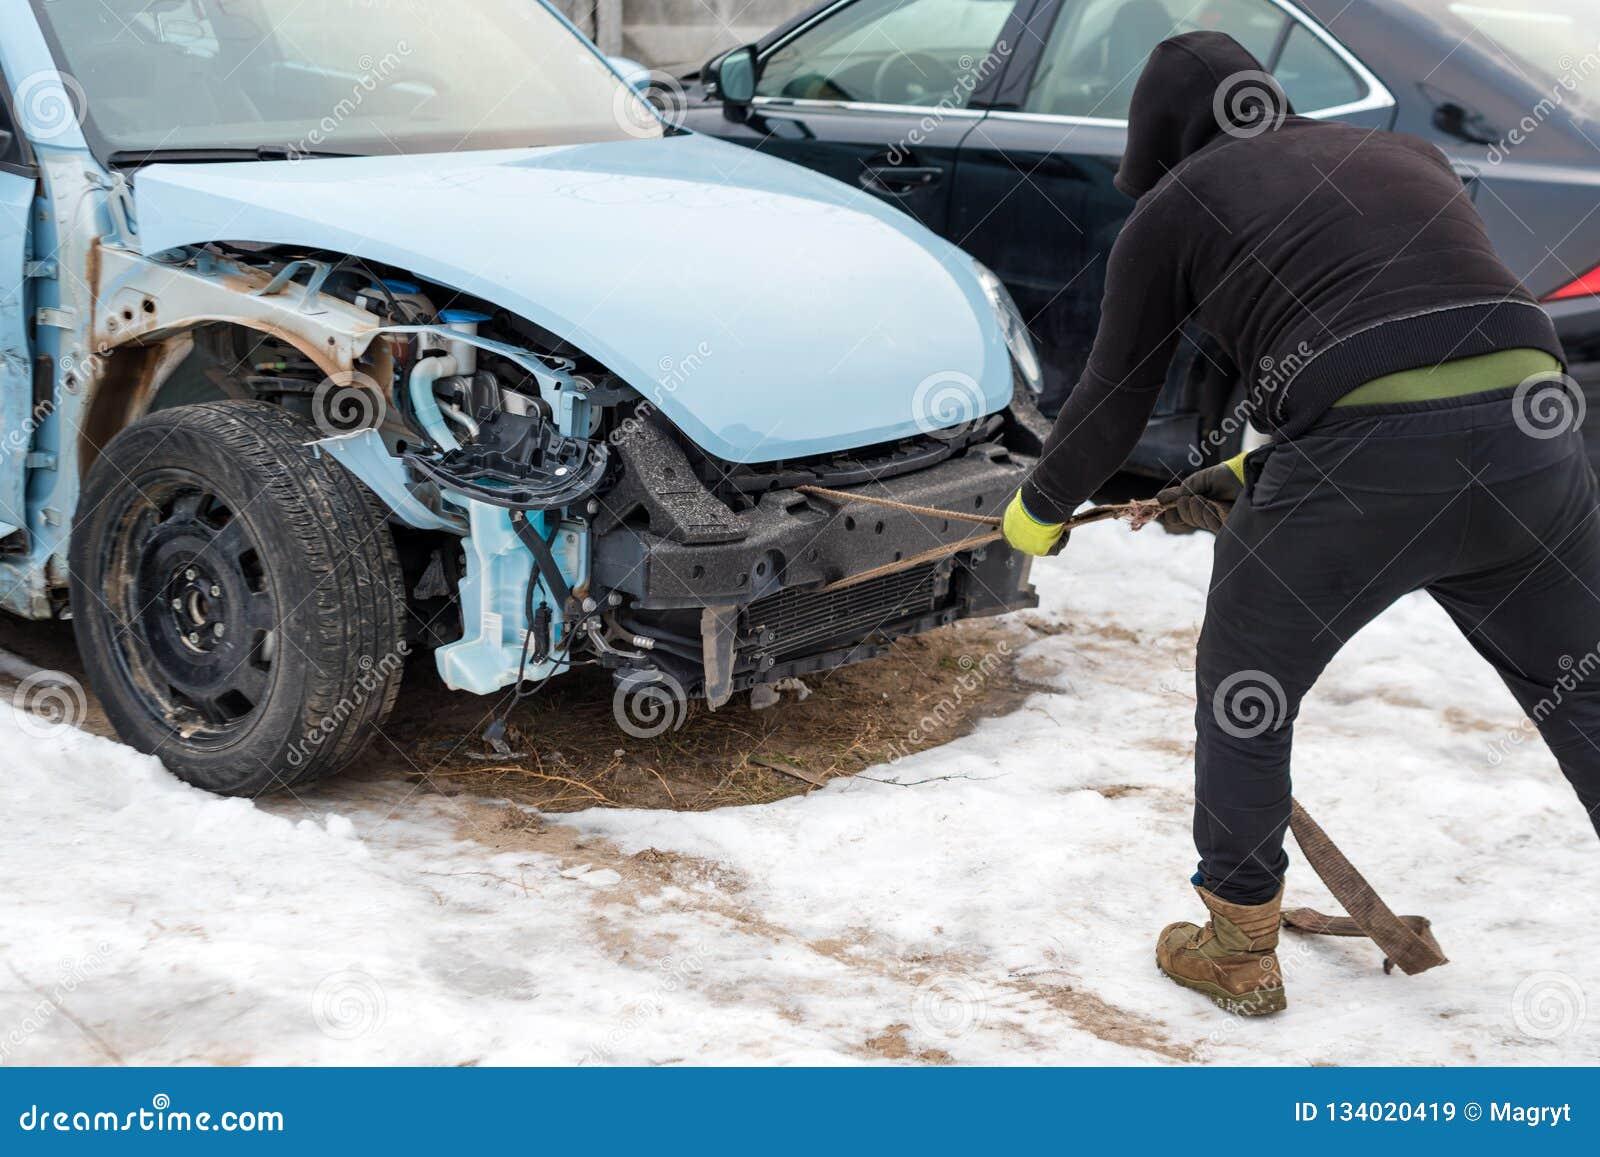 Defektes Auto nach einem Unfall E r r automobil